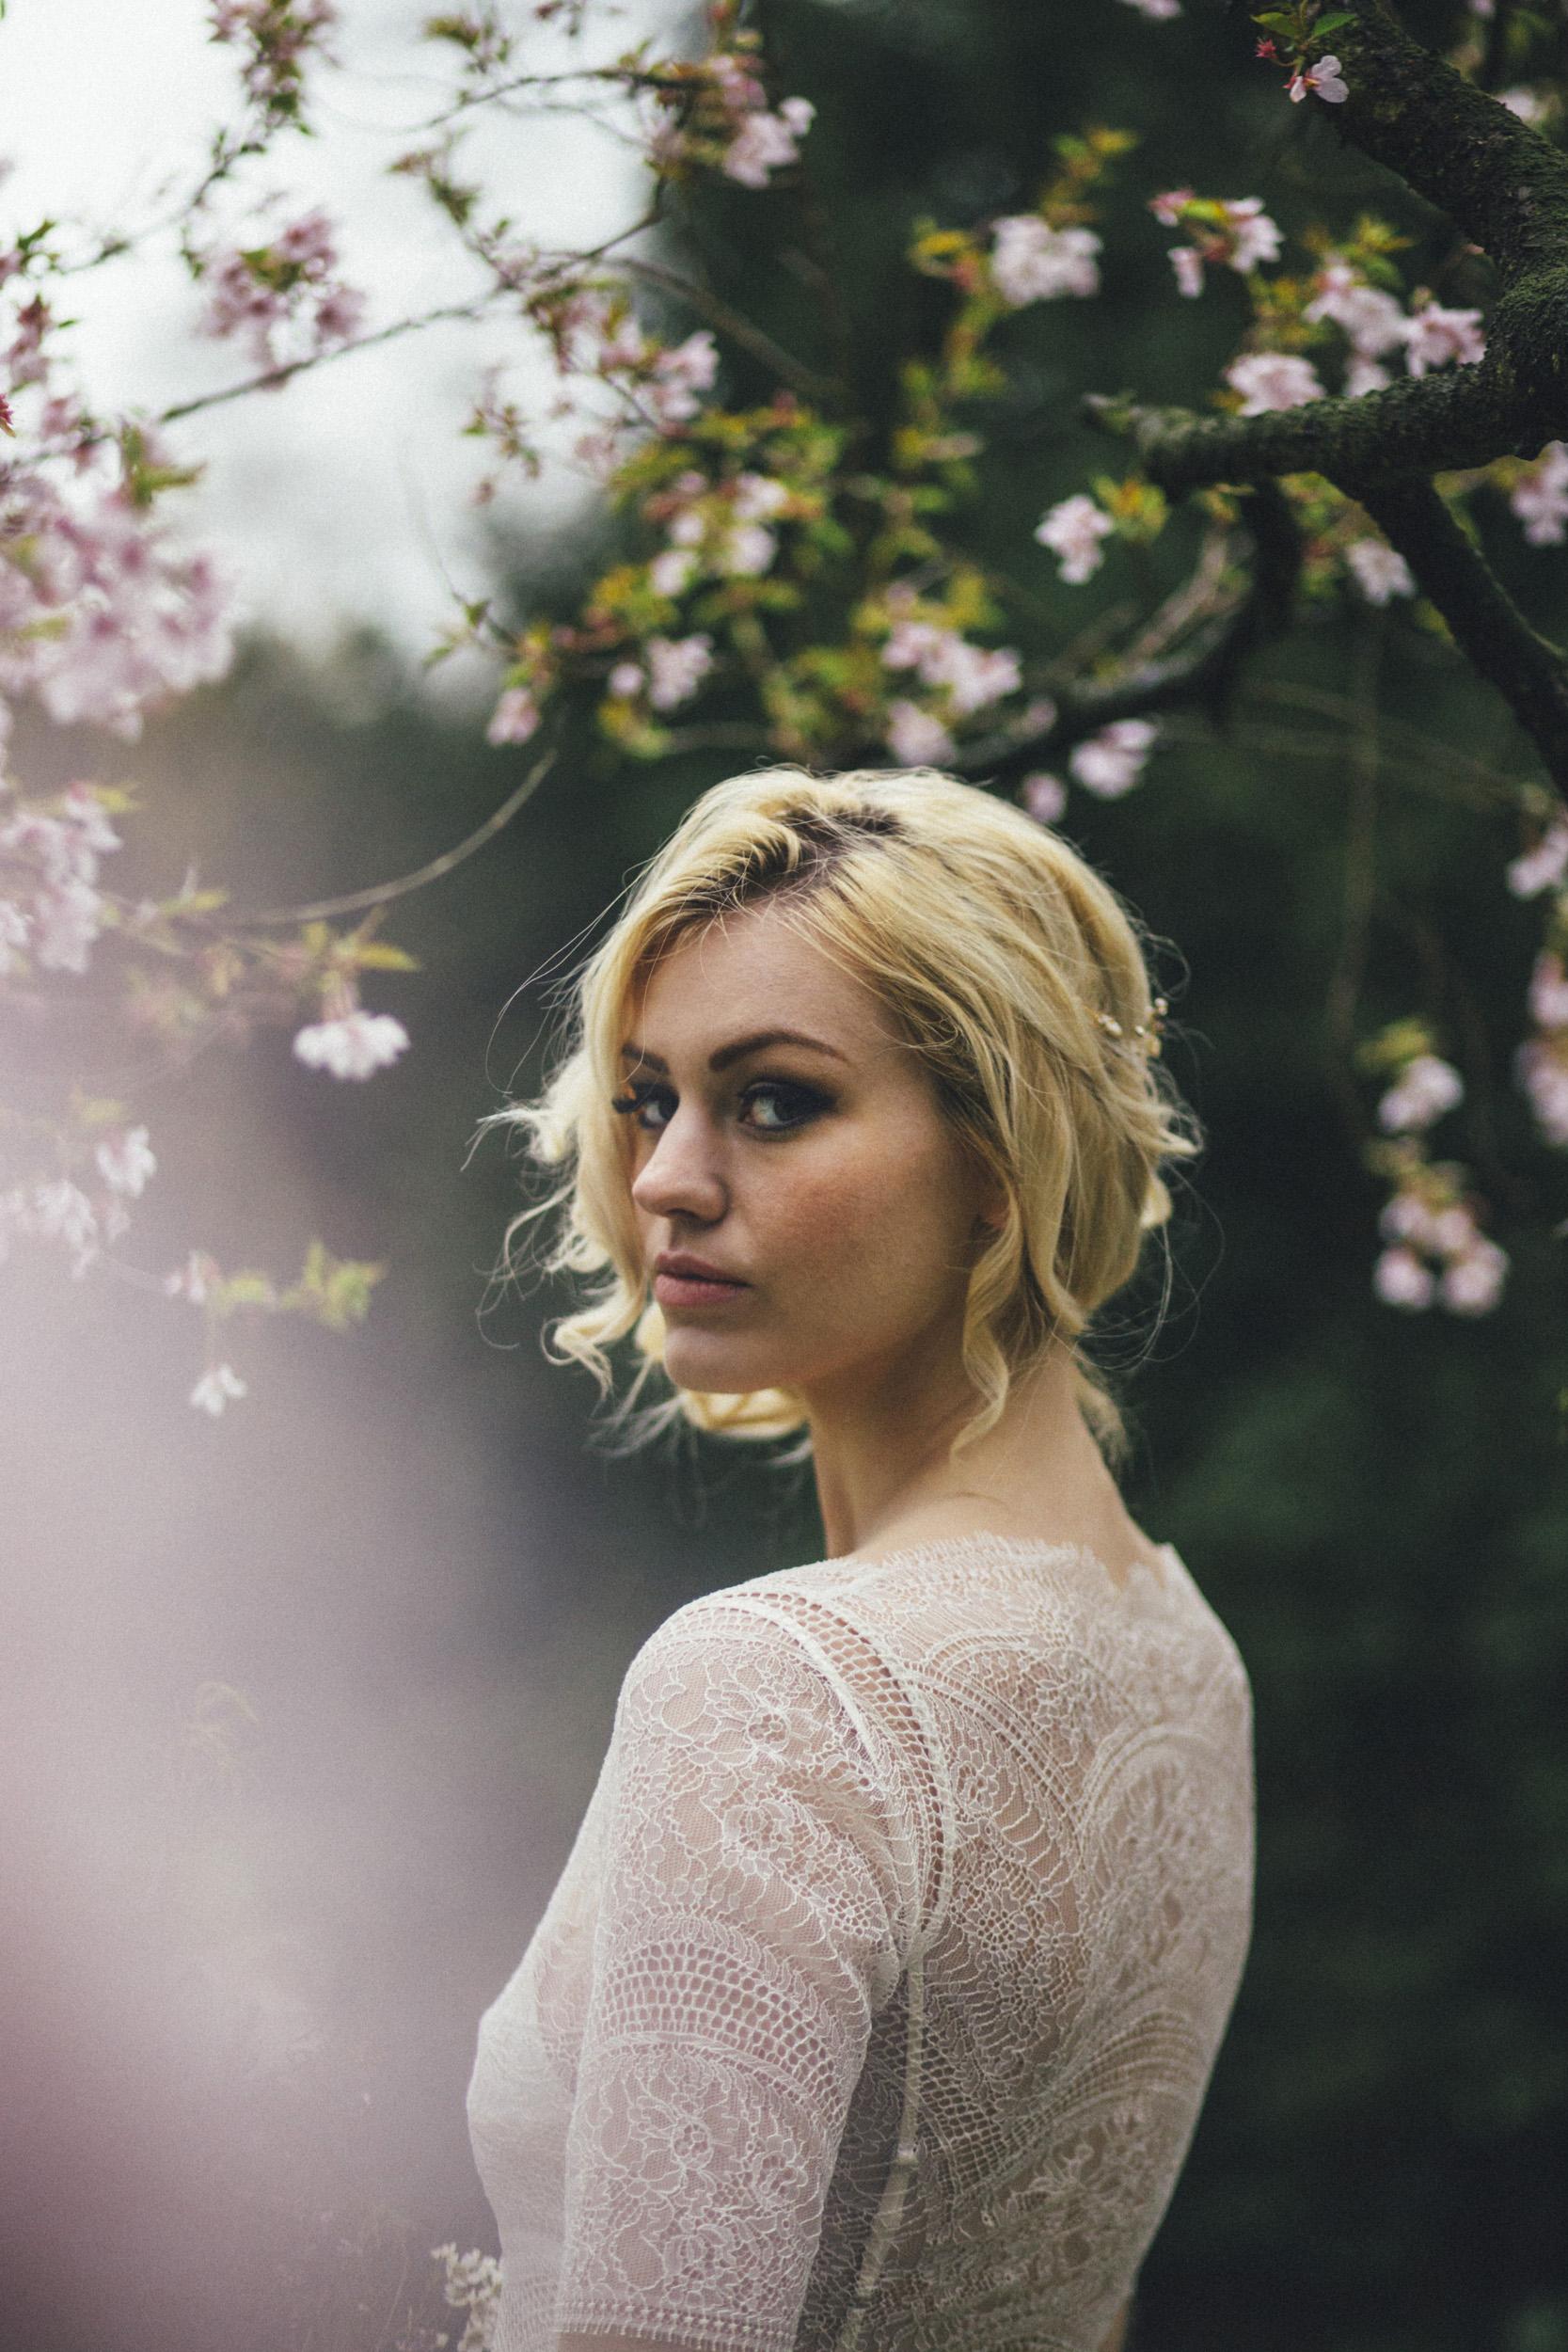 Spring-Bridal-Kate-Beaumont-Shelley-Richmond-Vintage-Wedding-Dress-3.jpg